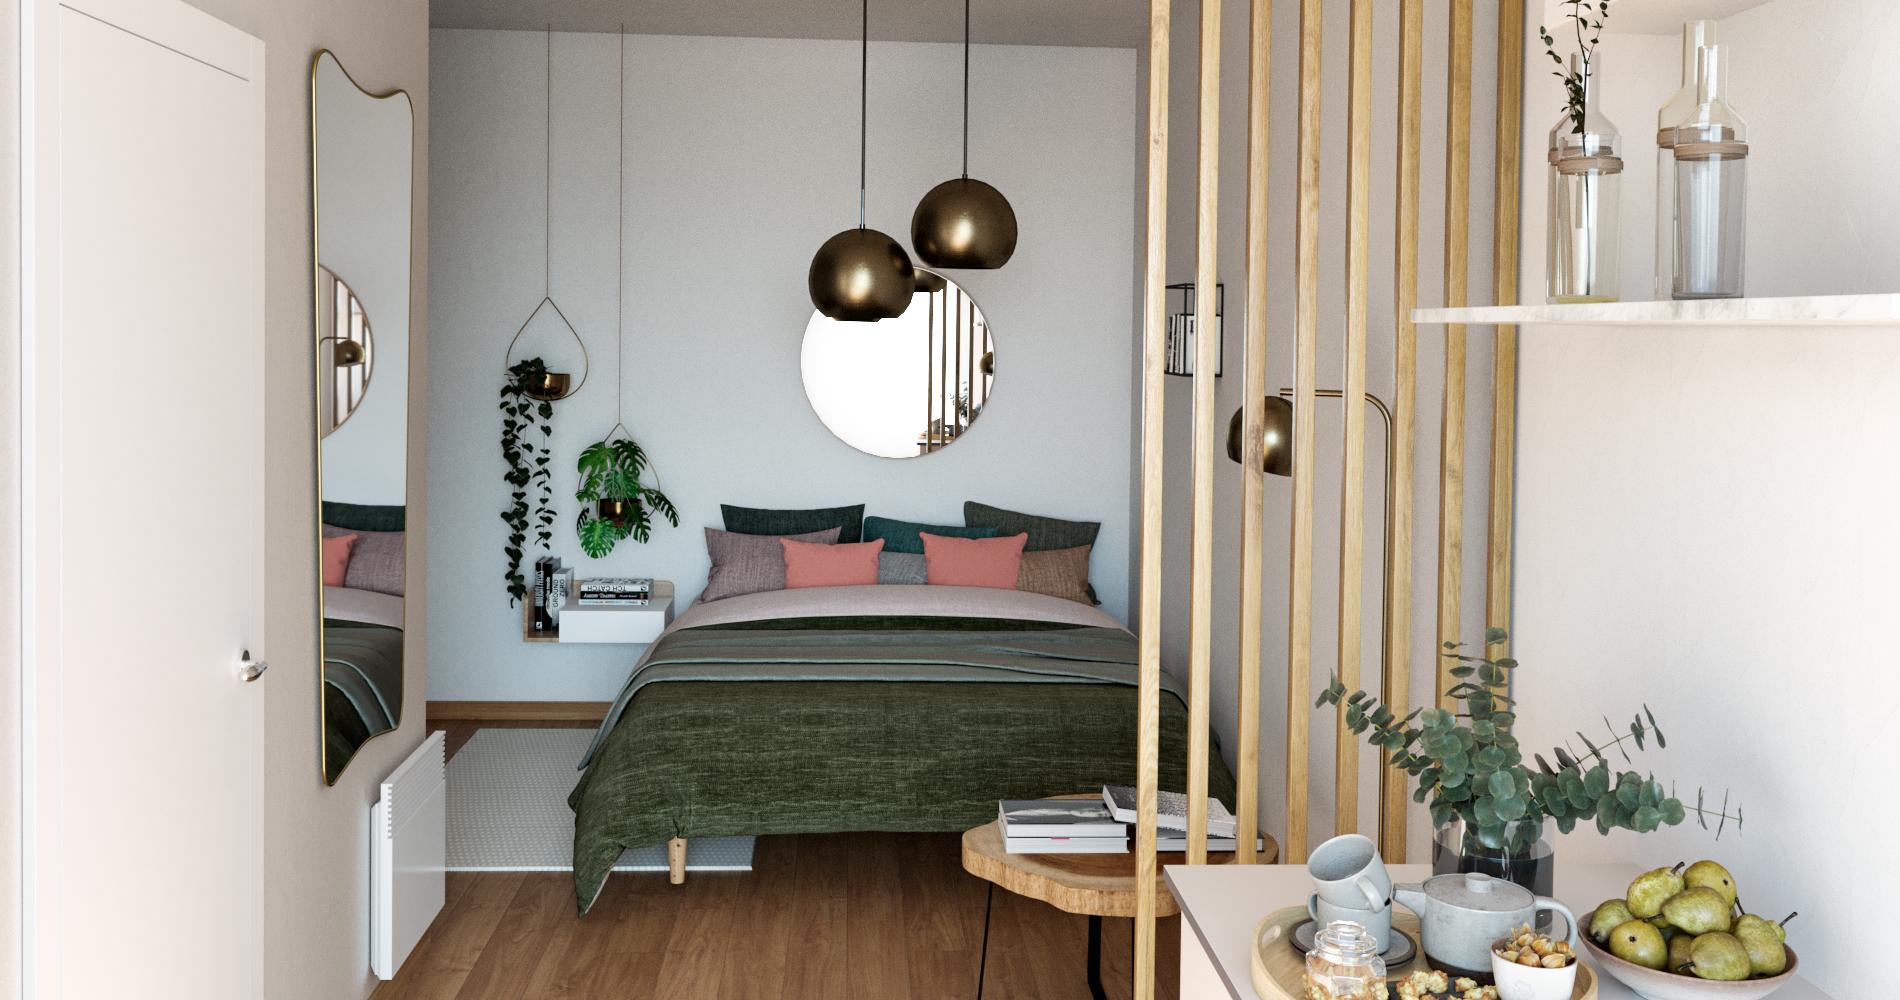 comment donner de la lumi re un appartement sombre madame figaro. Black Bedroom Furniture Sets. Home Design Ideas